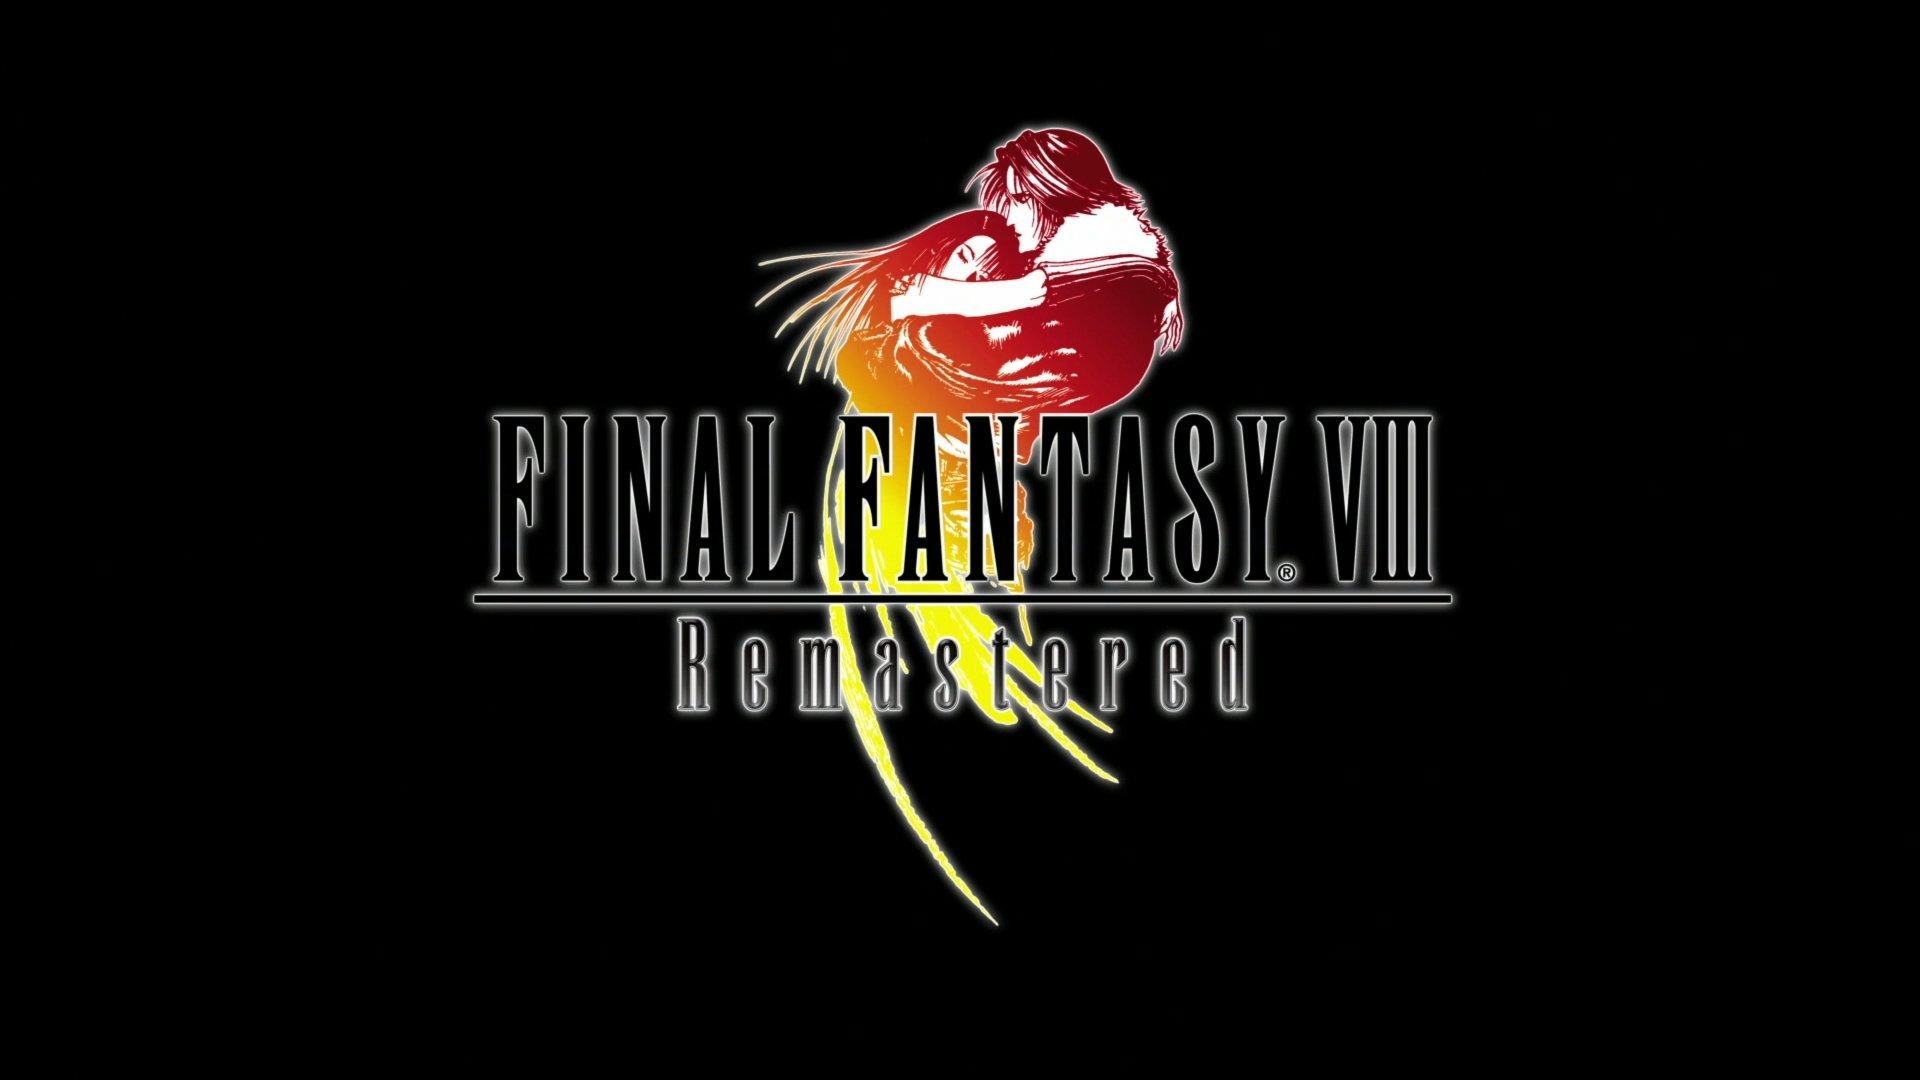 Final Fantasy VIII Remastered anunciado para PC, PS4, Switch e Xbox ...